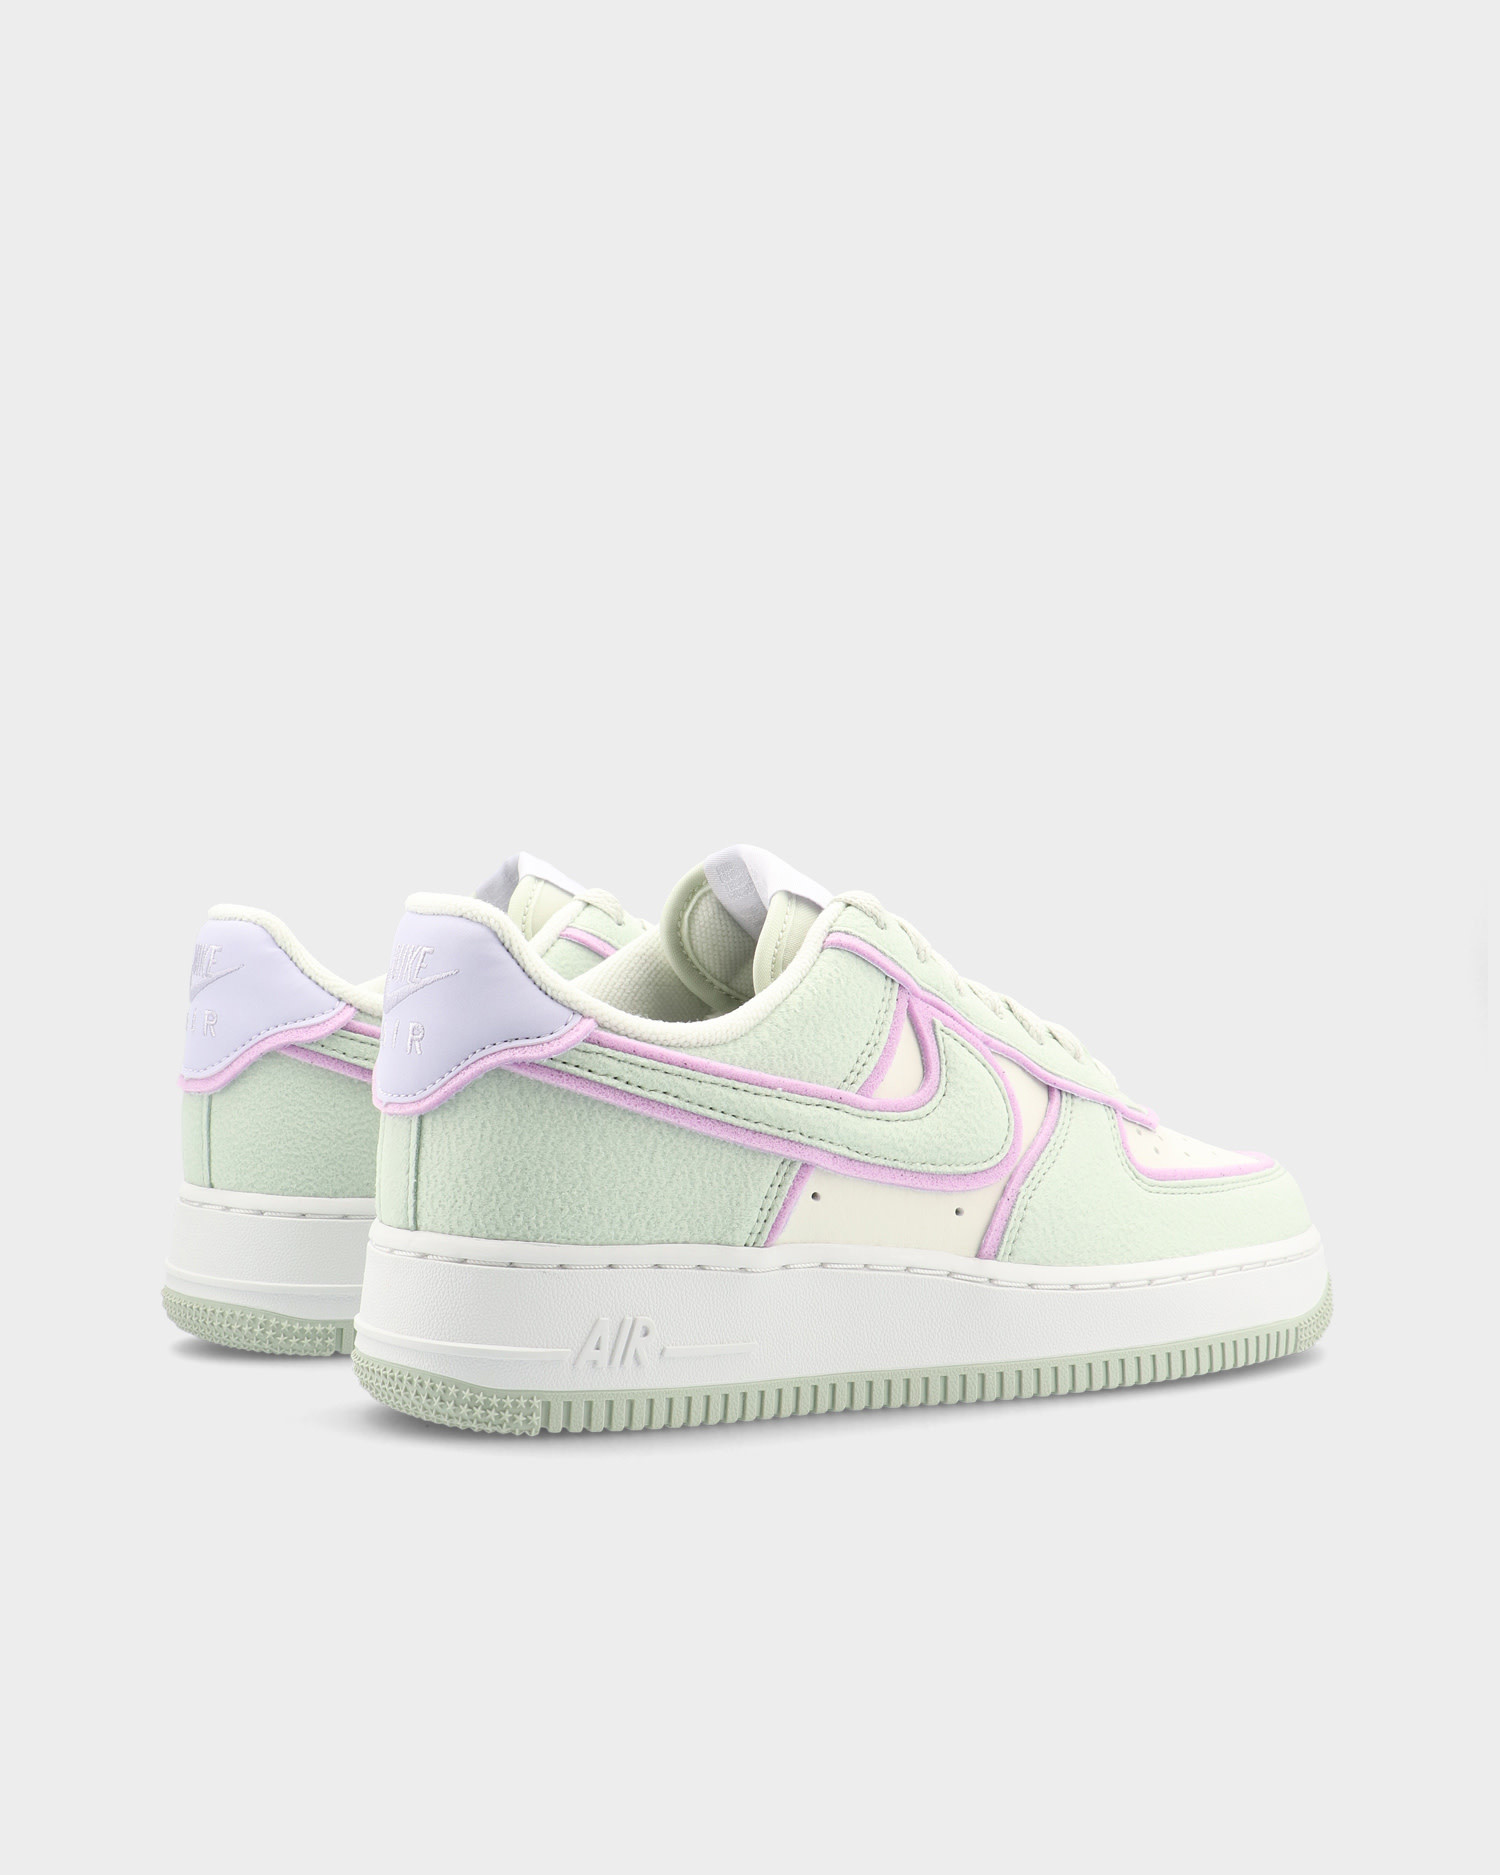 Nike air force 1 Sea glass/seafoam-pure violet